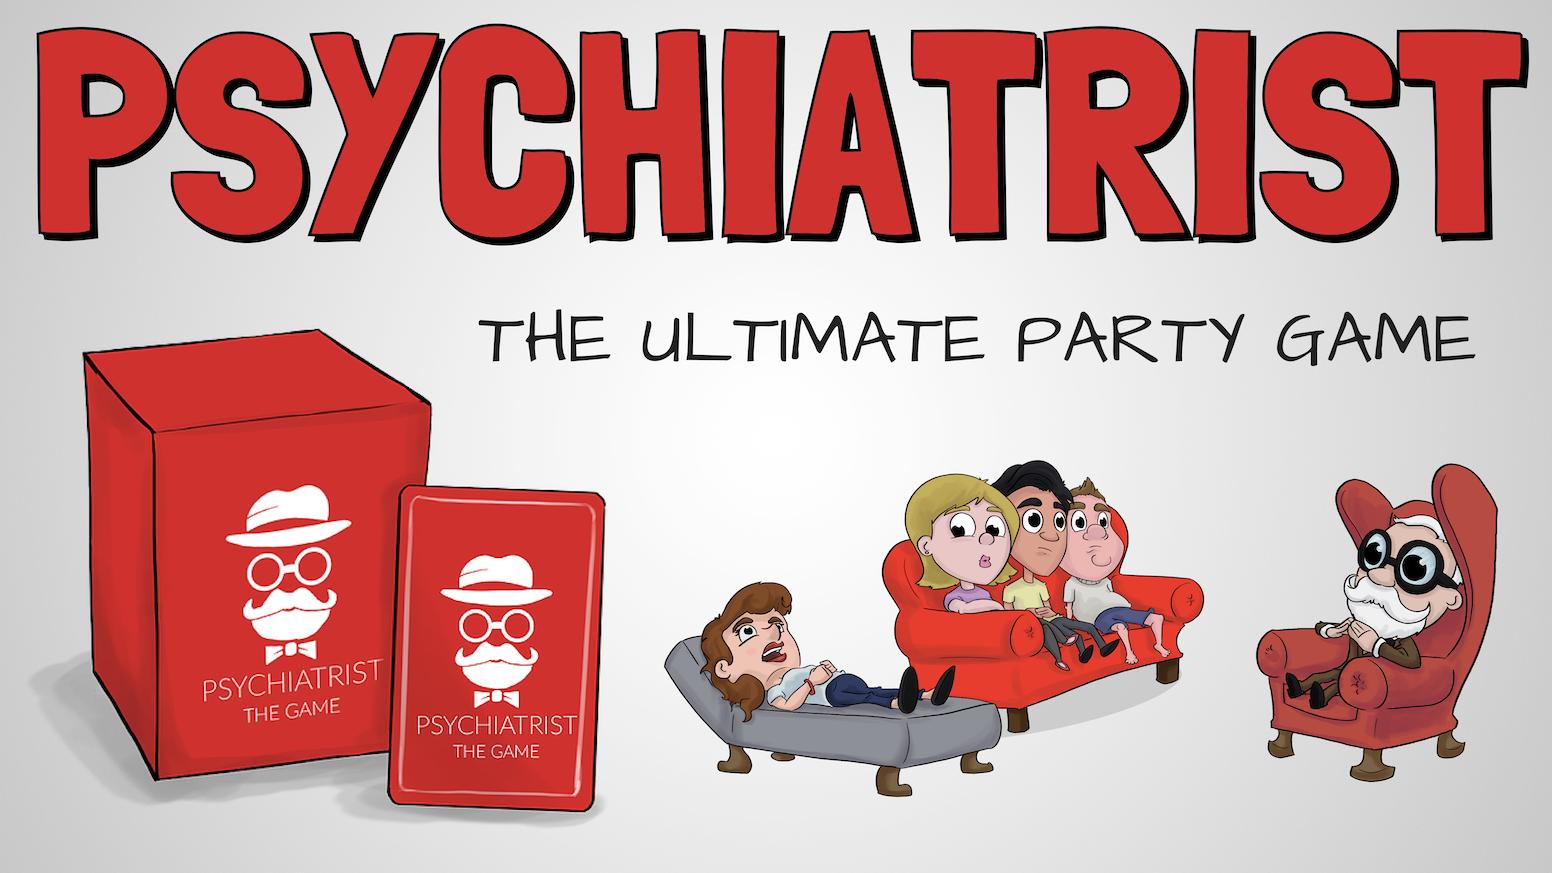 Psychiatrist The Ultimate Party Game By Psychiatrist Kickstarter